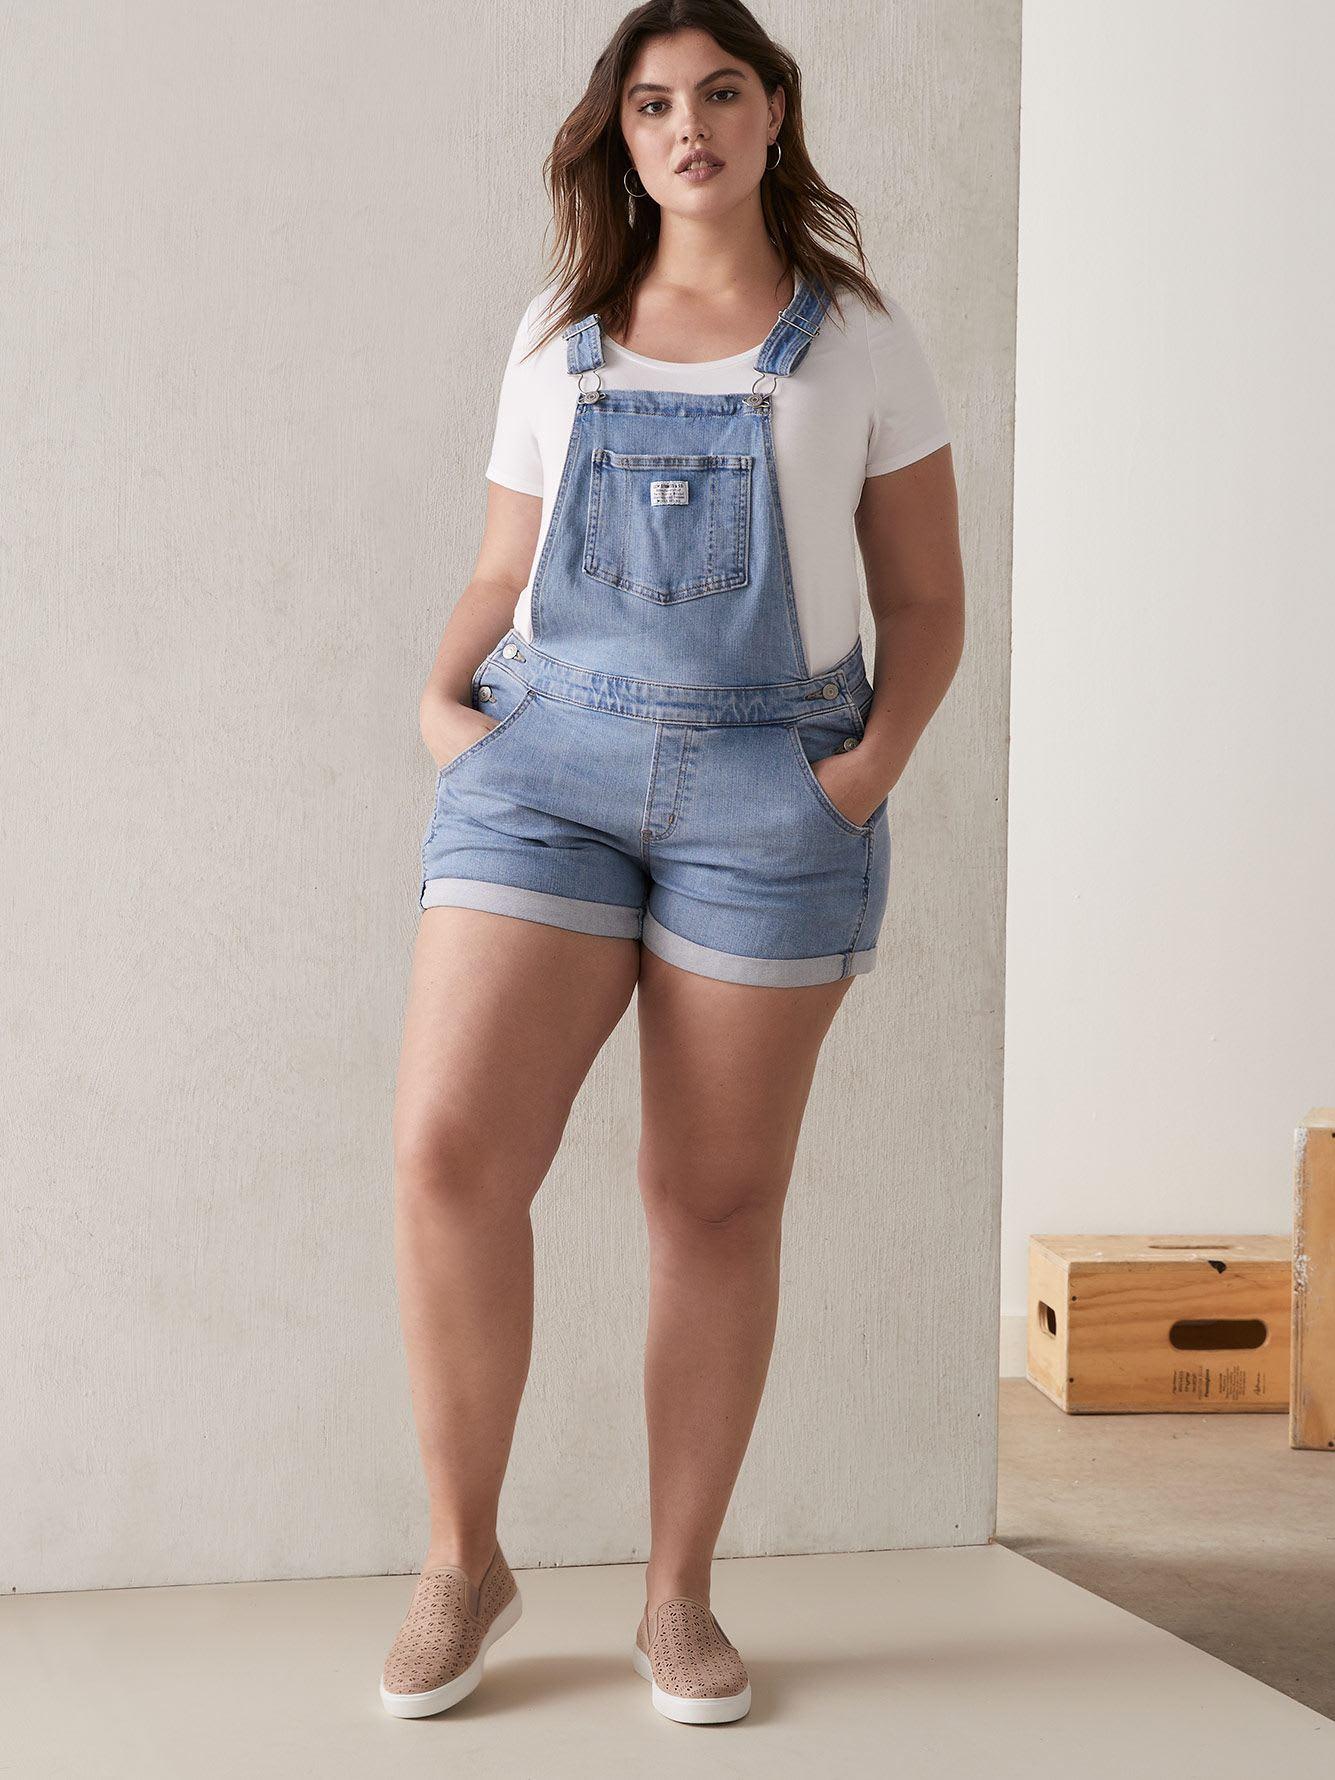 707fe706f4be Short Denim Overalls in Sunbather - Levi's   Addition Elle